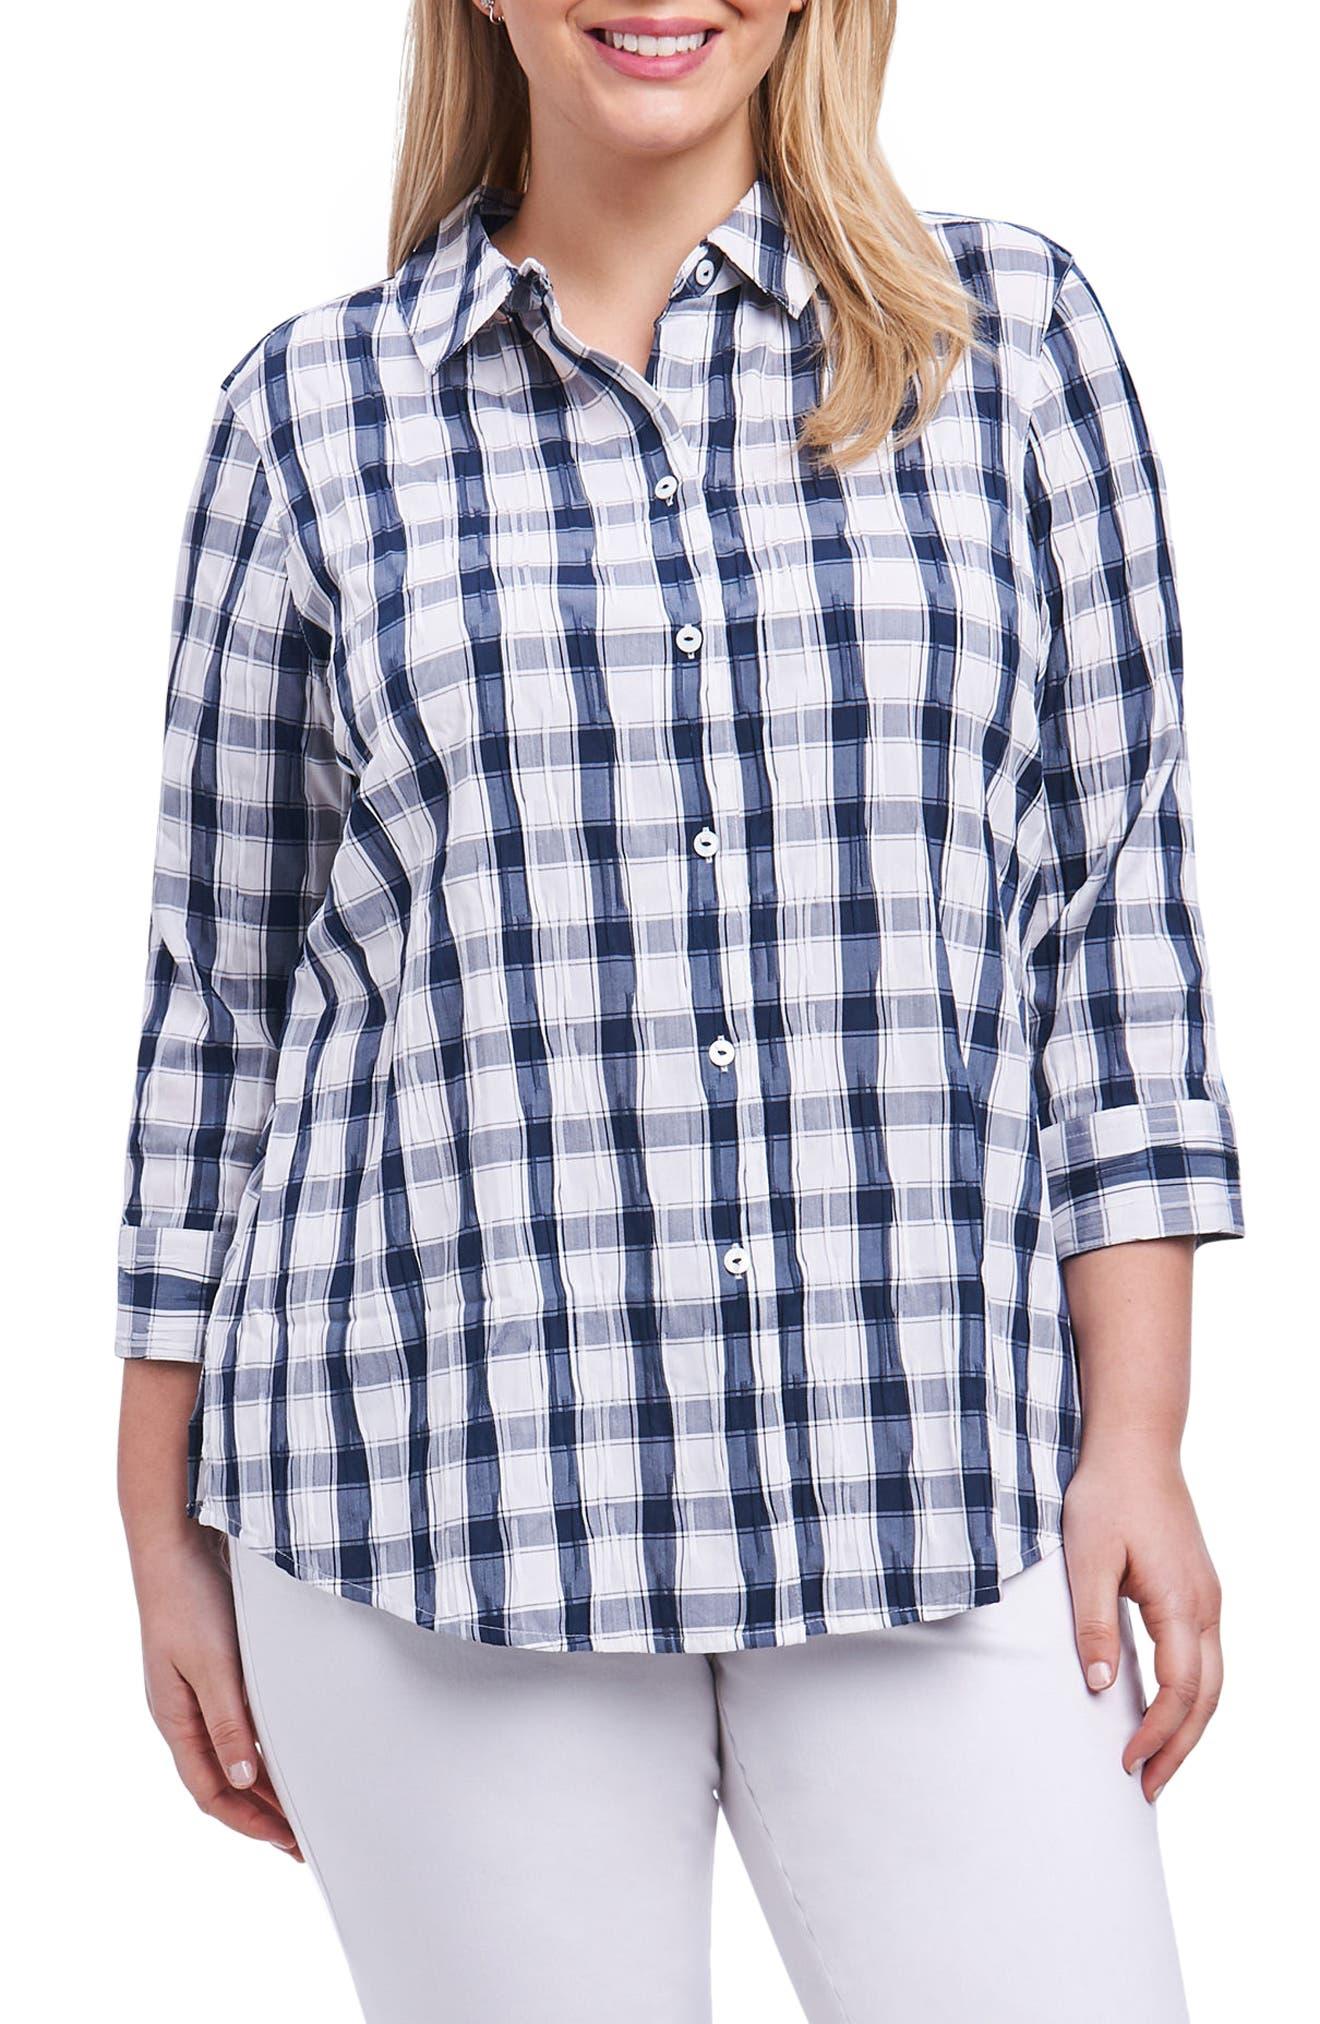 Foxcroft Sue Shaped Fit Crinkle Plaid Shirt (Plus Size)